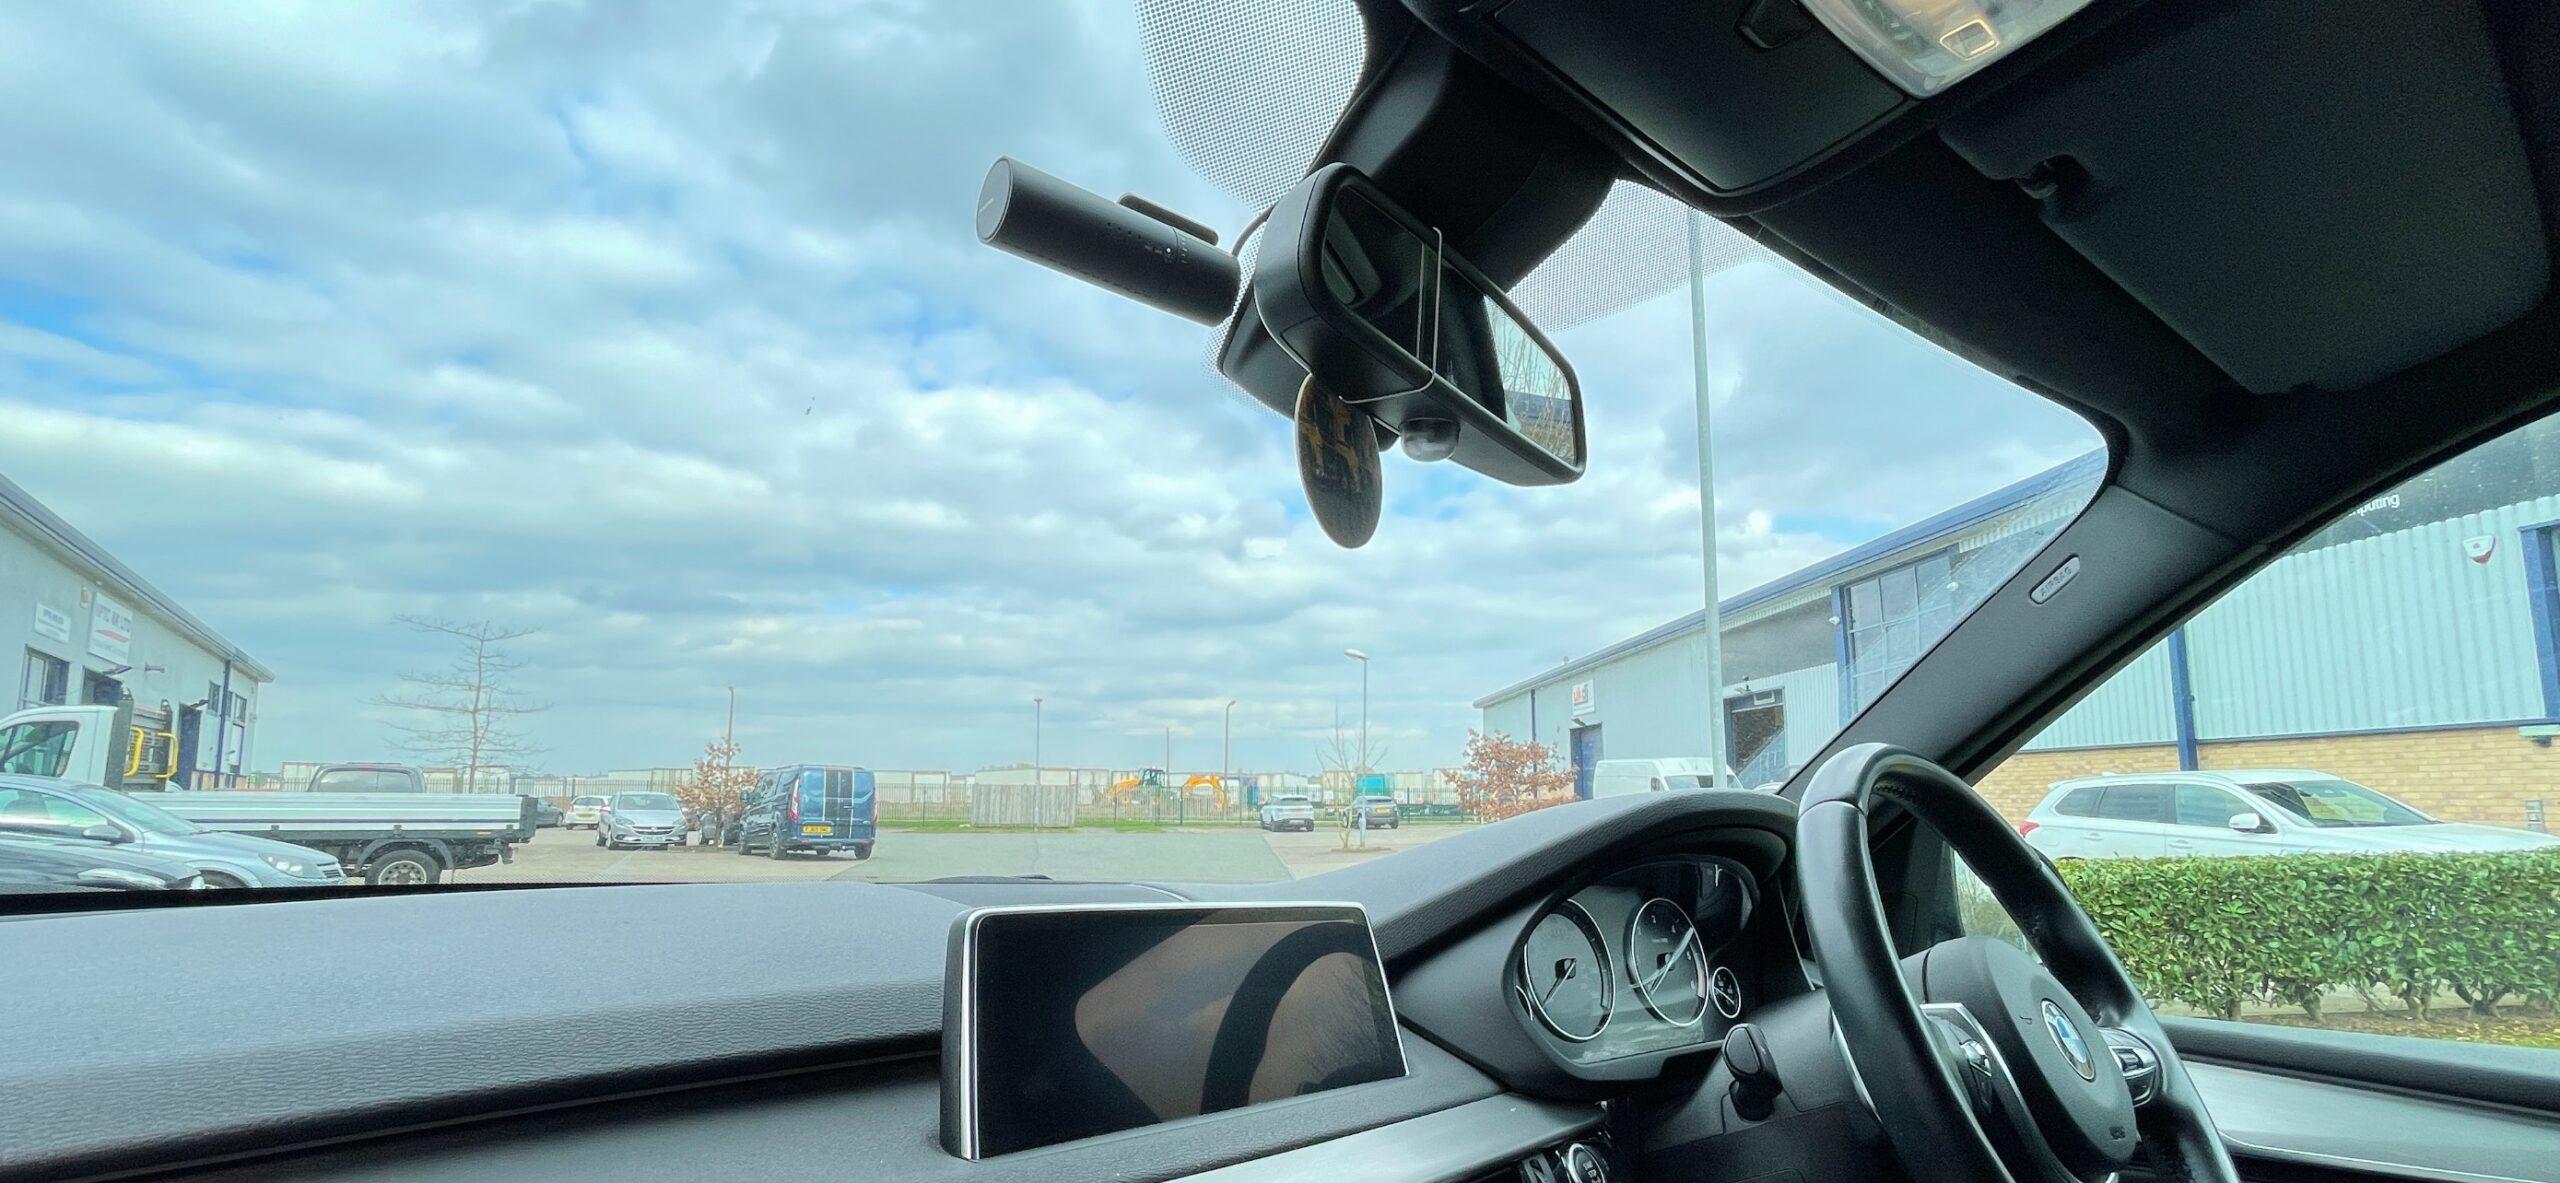 BMW X5 Dash Cam Nottingham